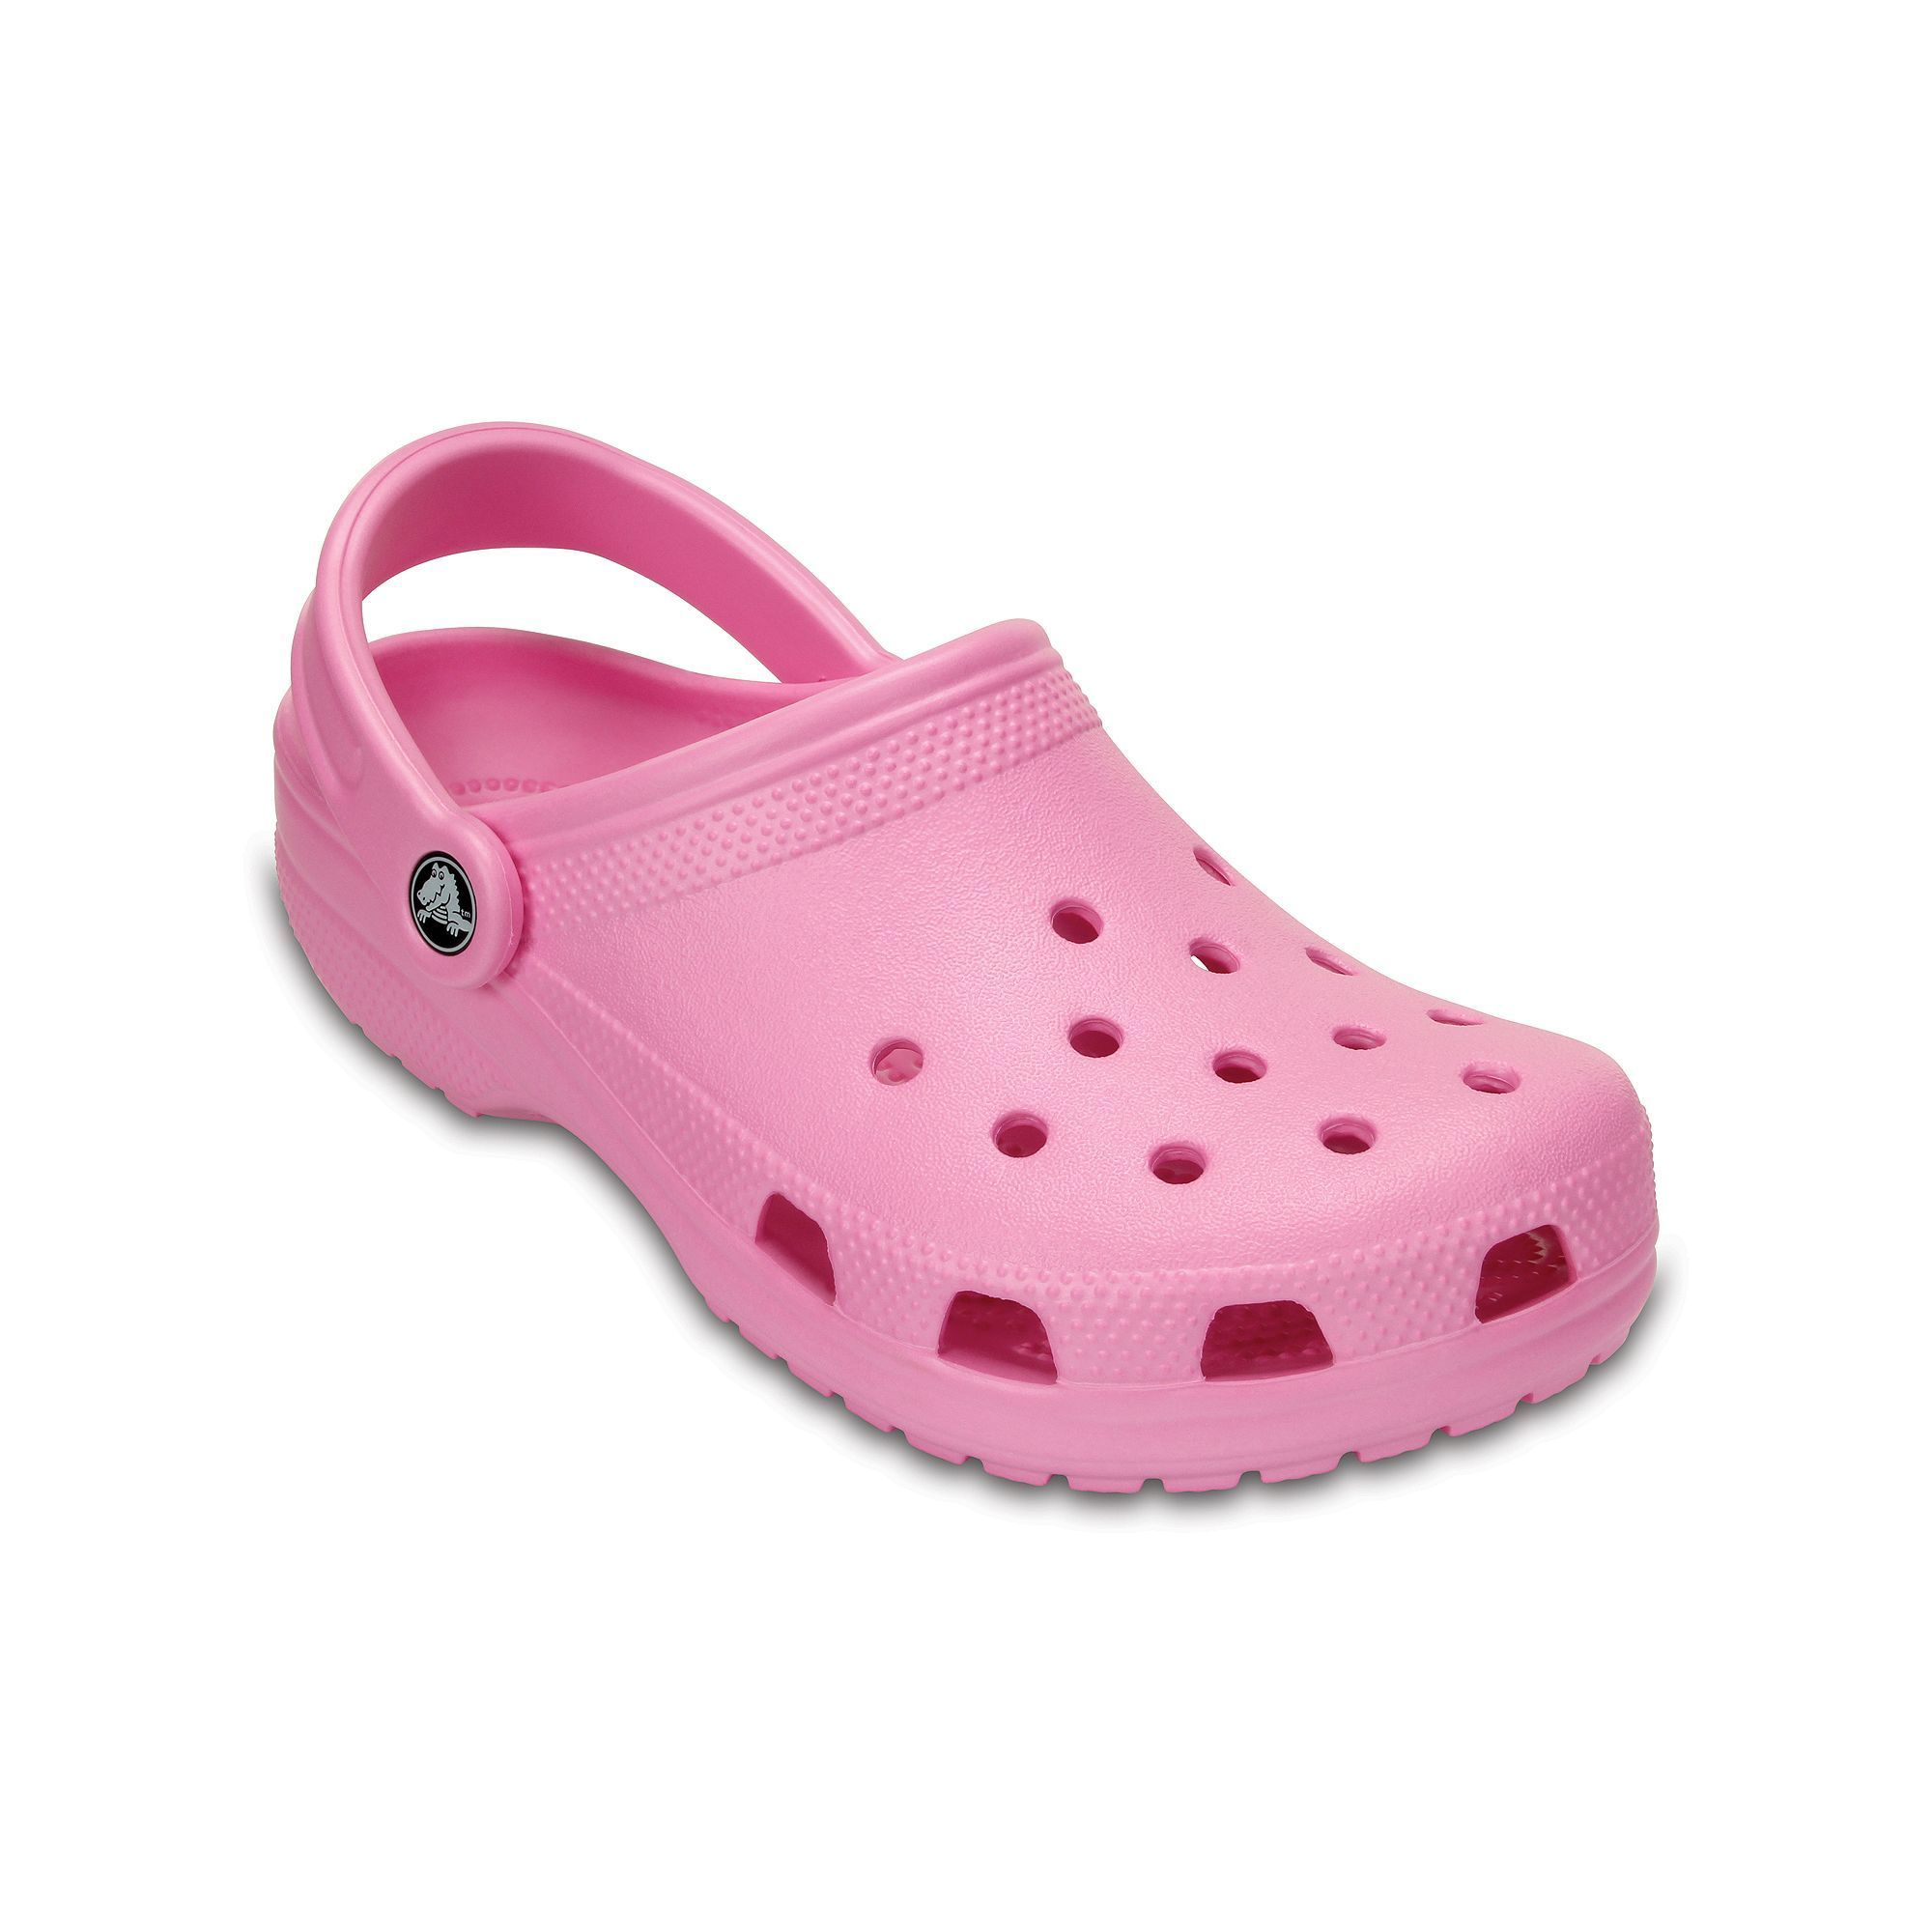 efb630f9e4ea1 Crocs Classic Adult Clogs